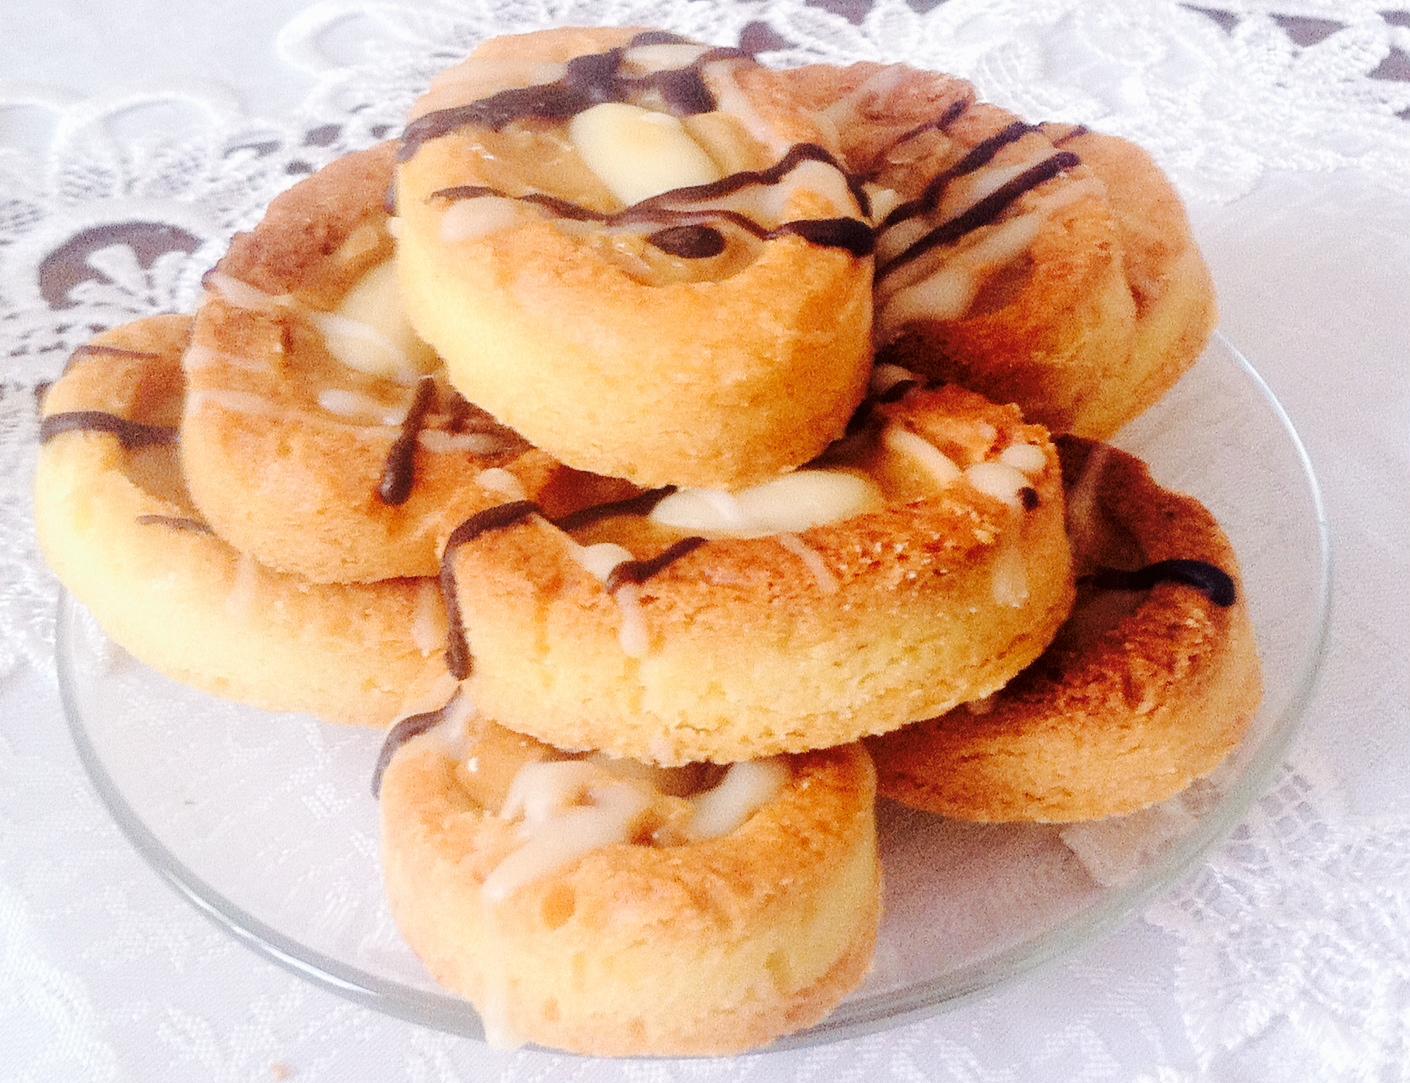 حلوى بجوز الهند ونستلي كاراميل